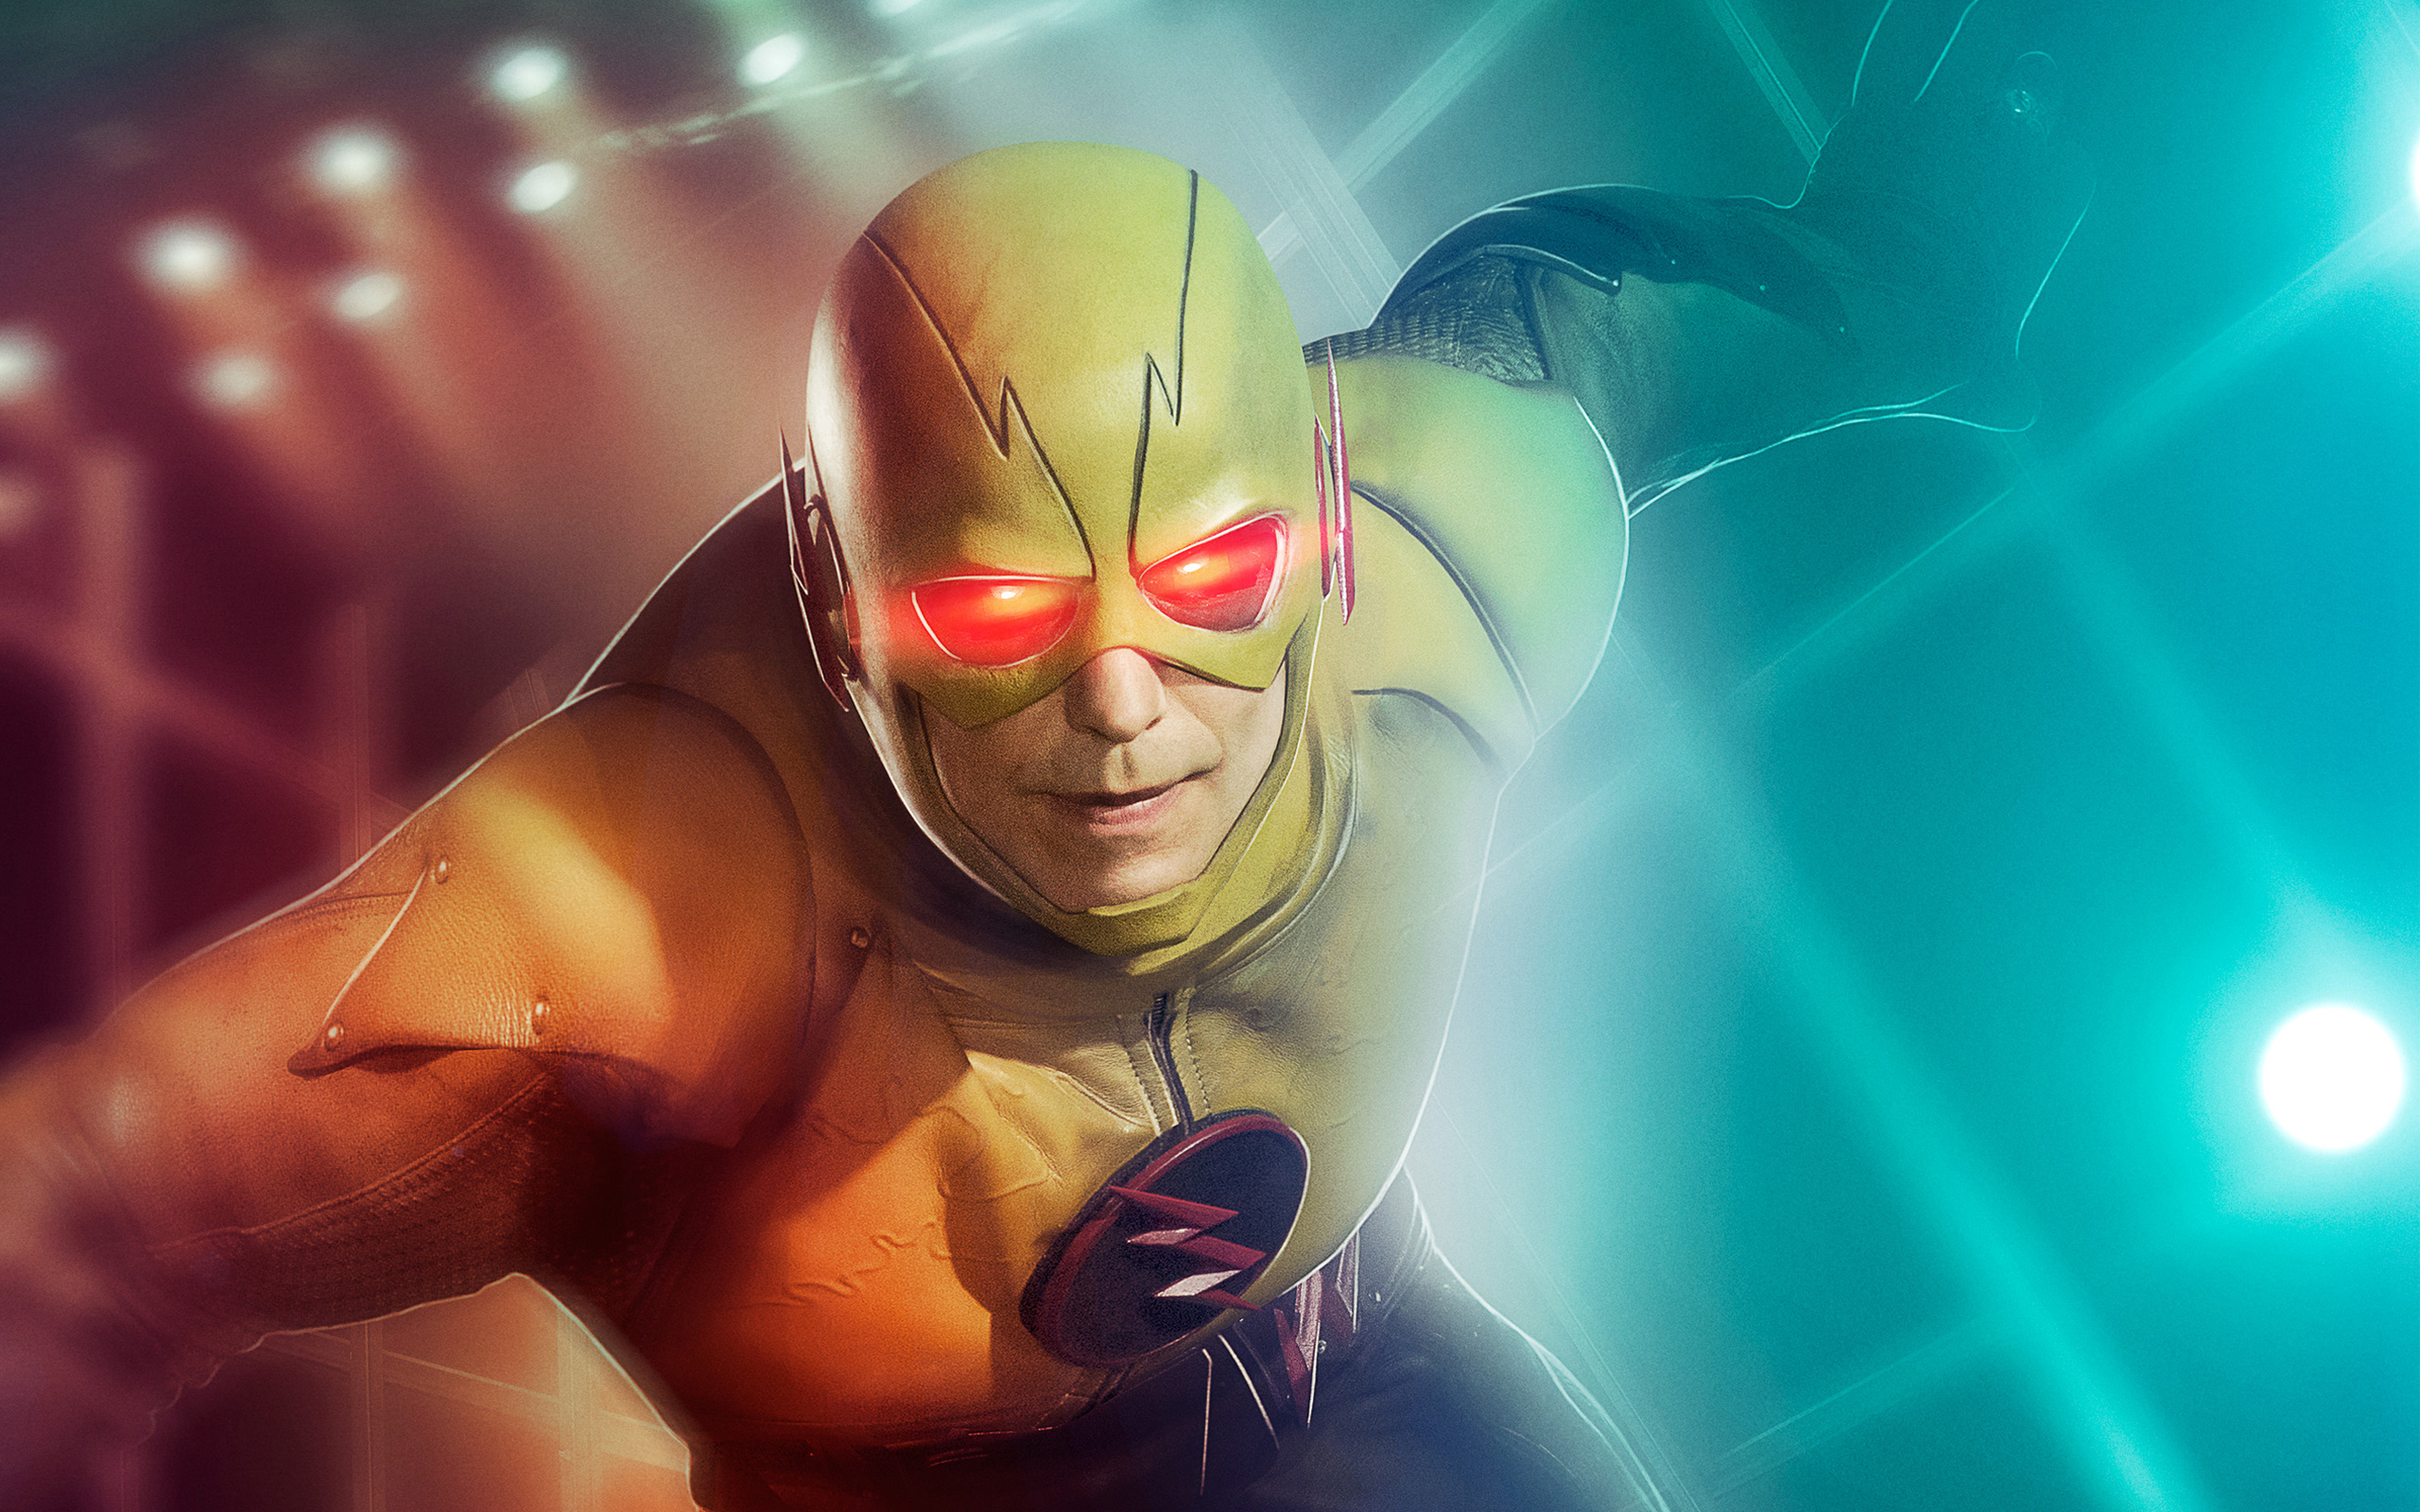 Eddie Thawne in The Flash Wallpapers HD Wallpapers 2560x1600